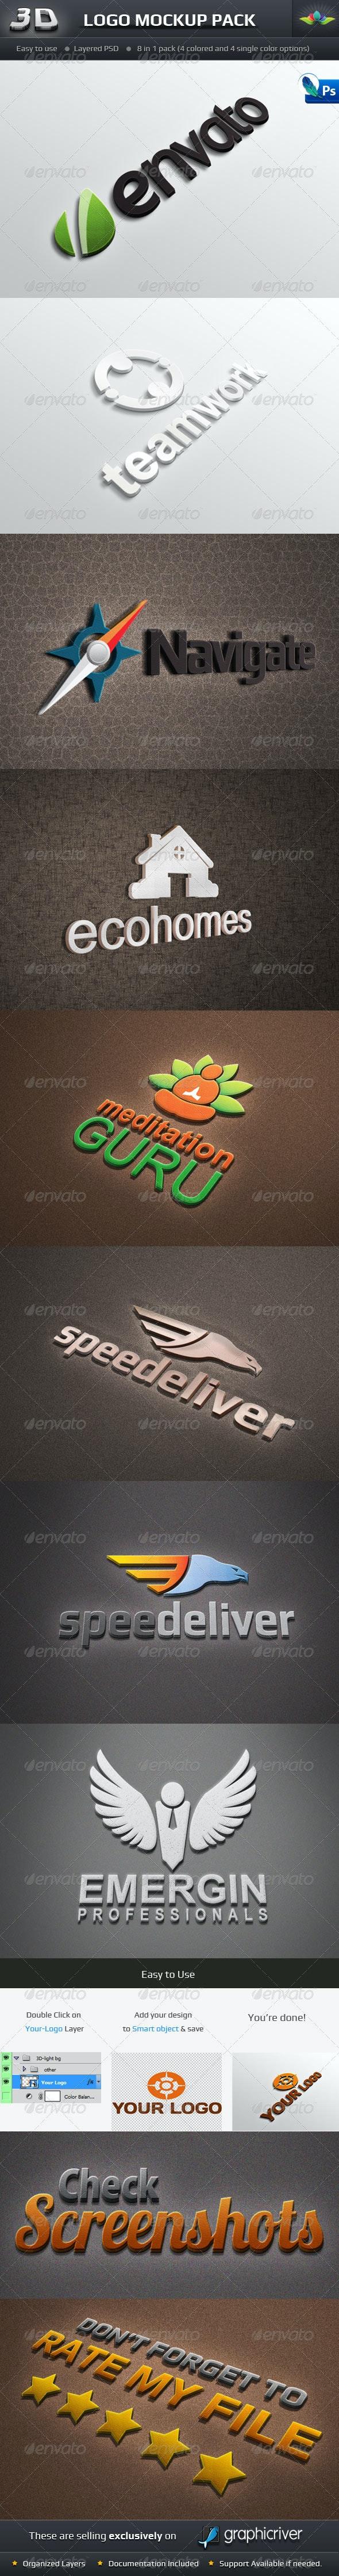 Photorealistic 3D Logo Mockup Pack - Logo Product Mock-Ups